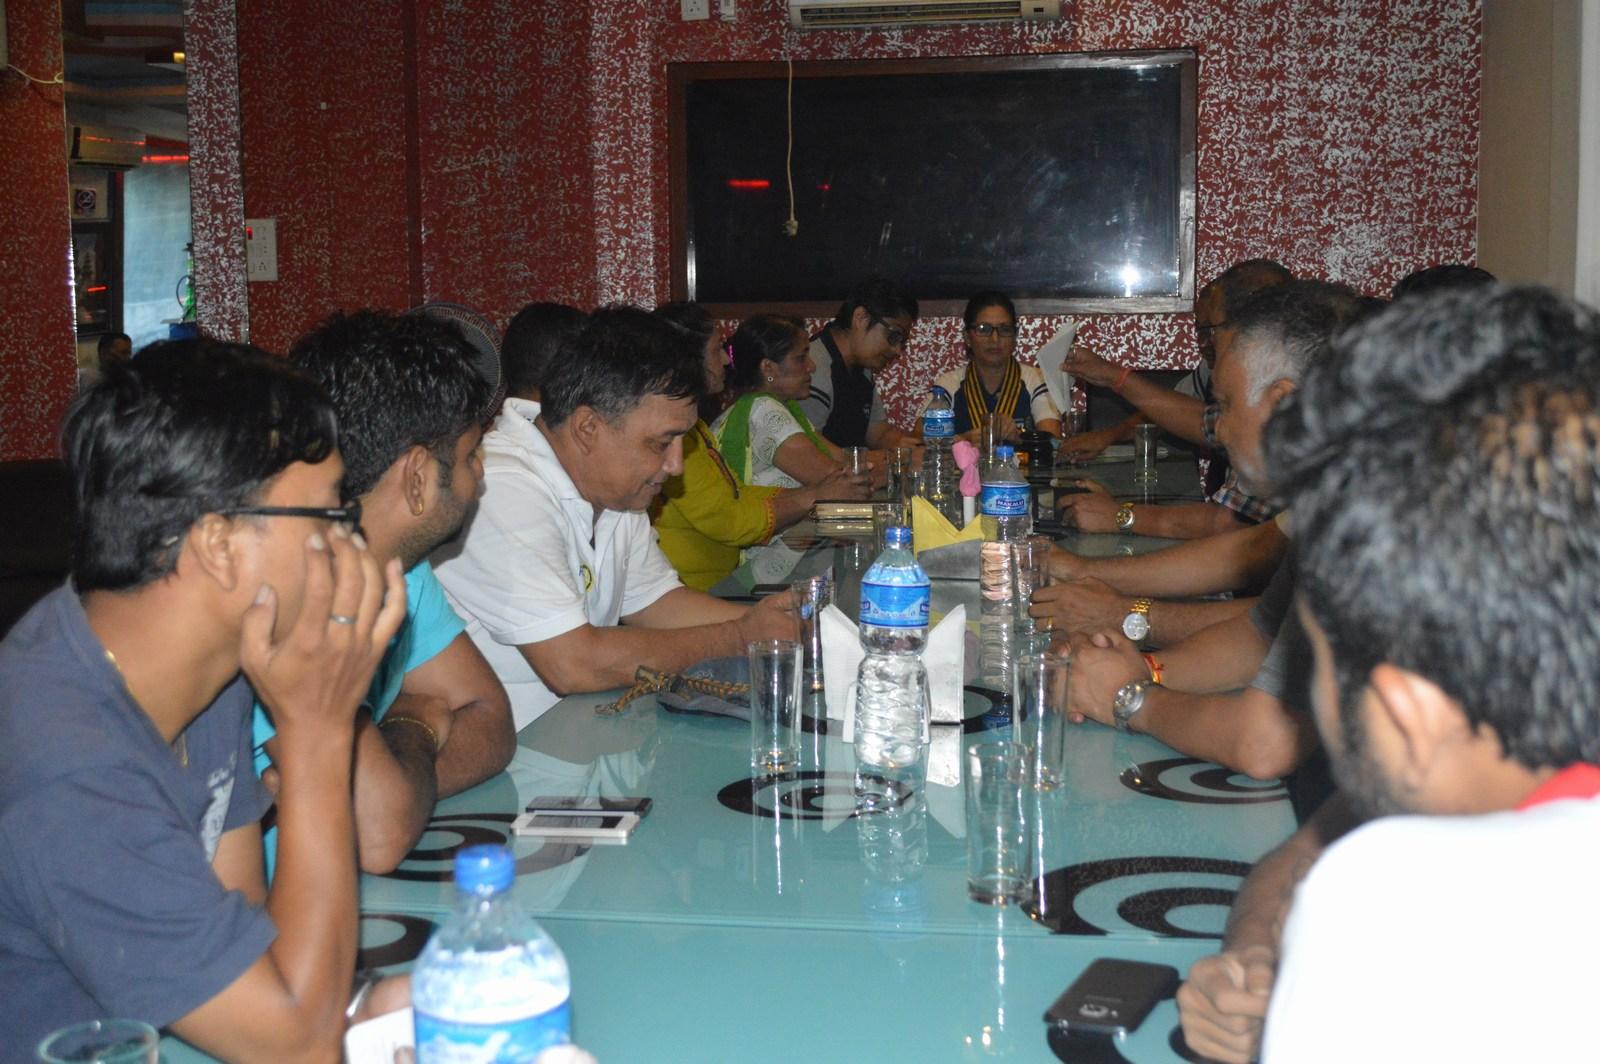 Weekly-Meeting-with-the-Guest-Speaker-DSP-Durga-Raj-Regmi-Rotary-Club-of-Kakarvitta-4